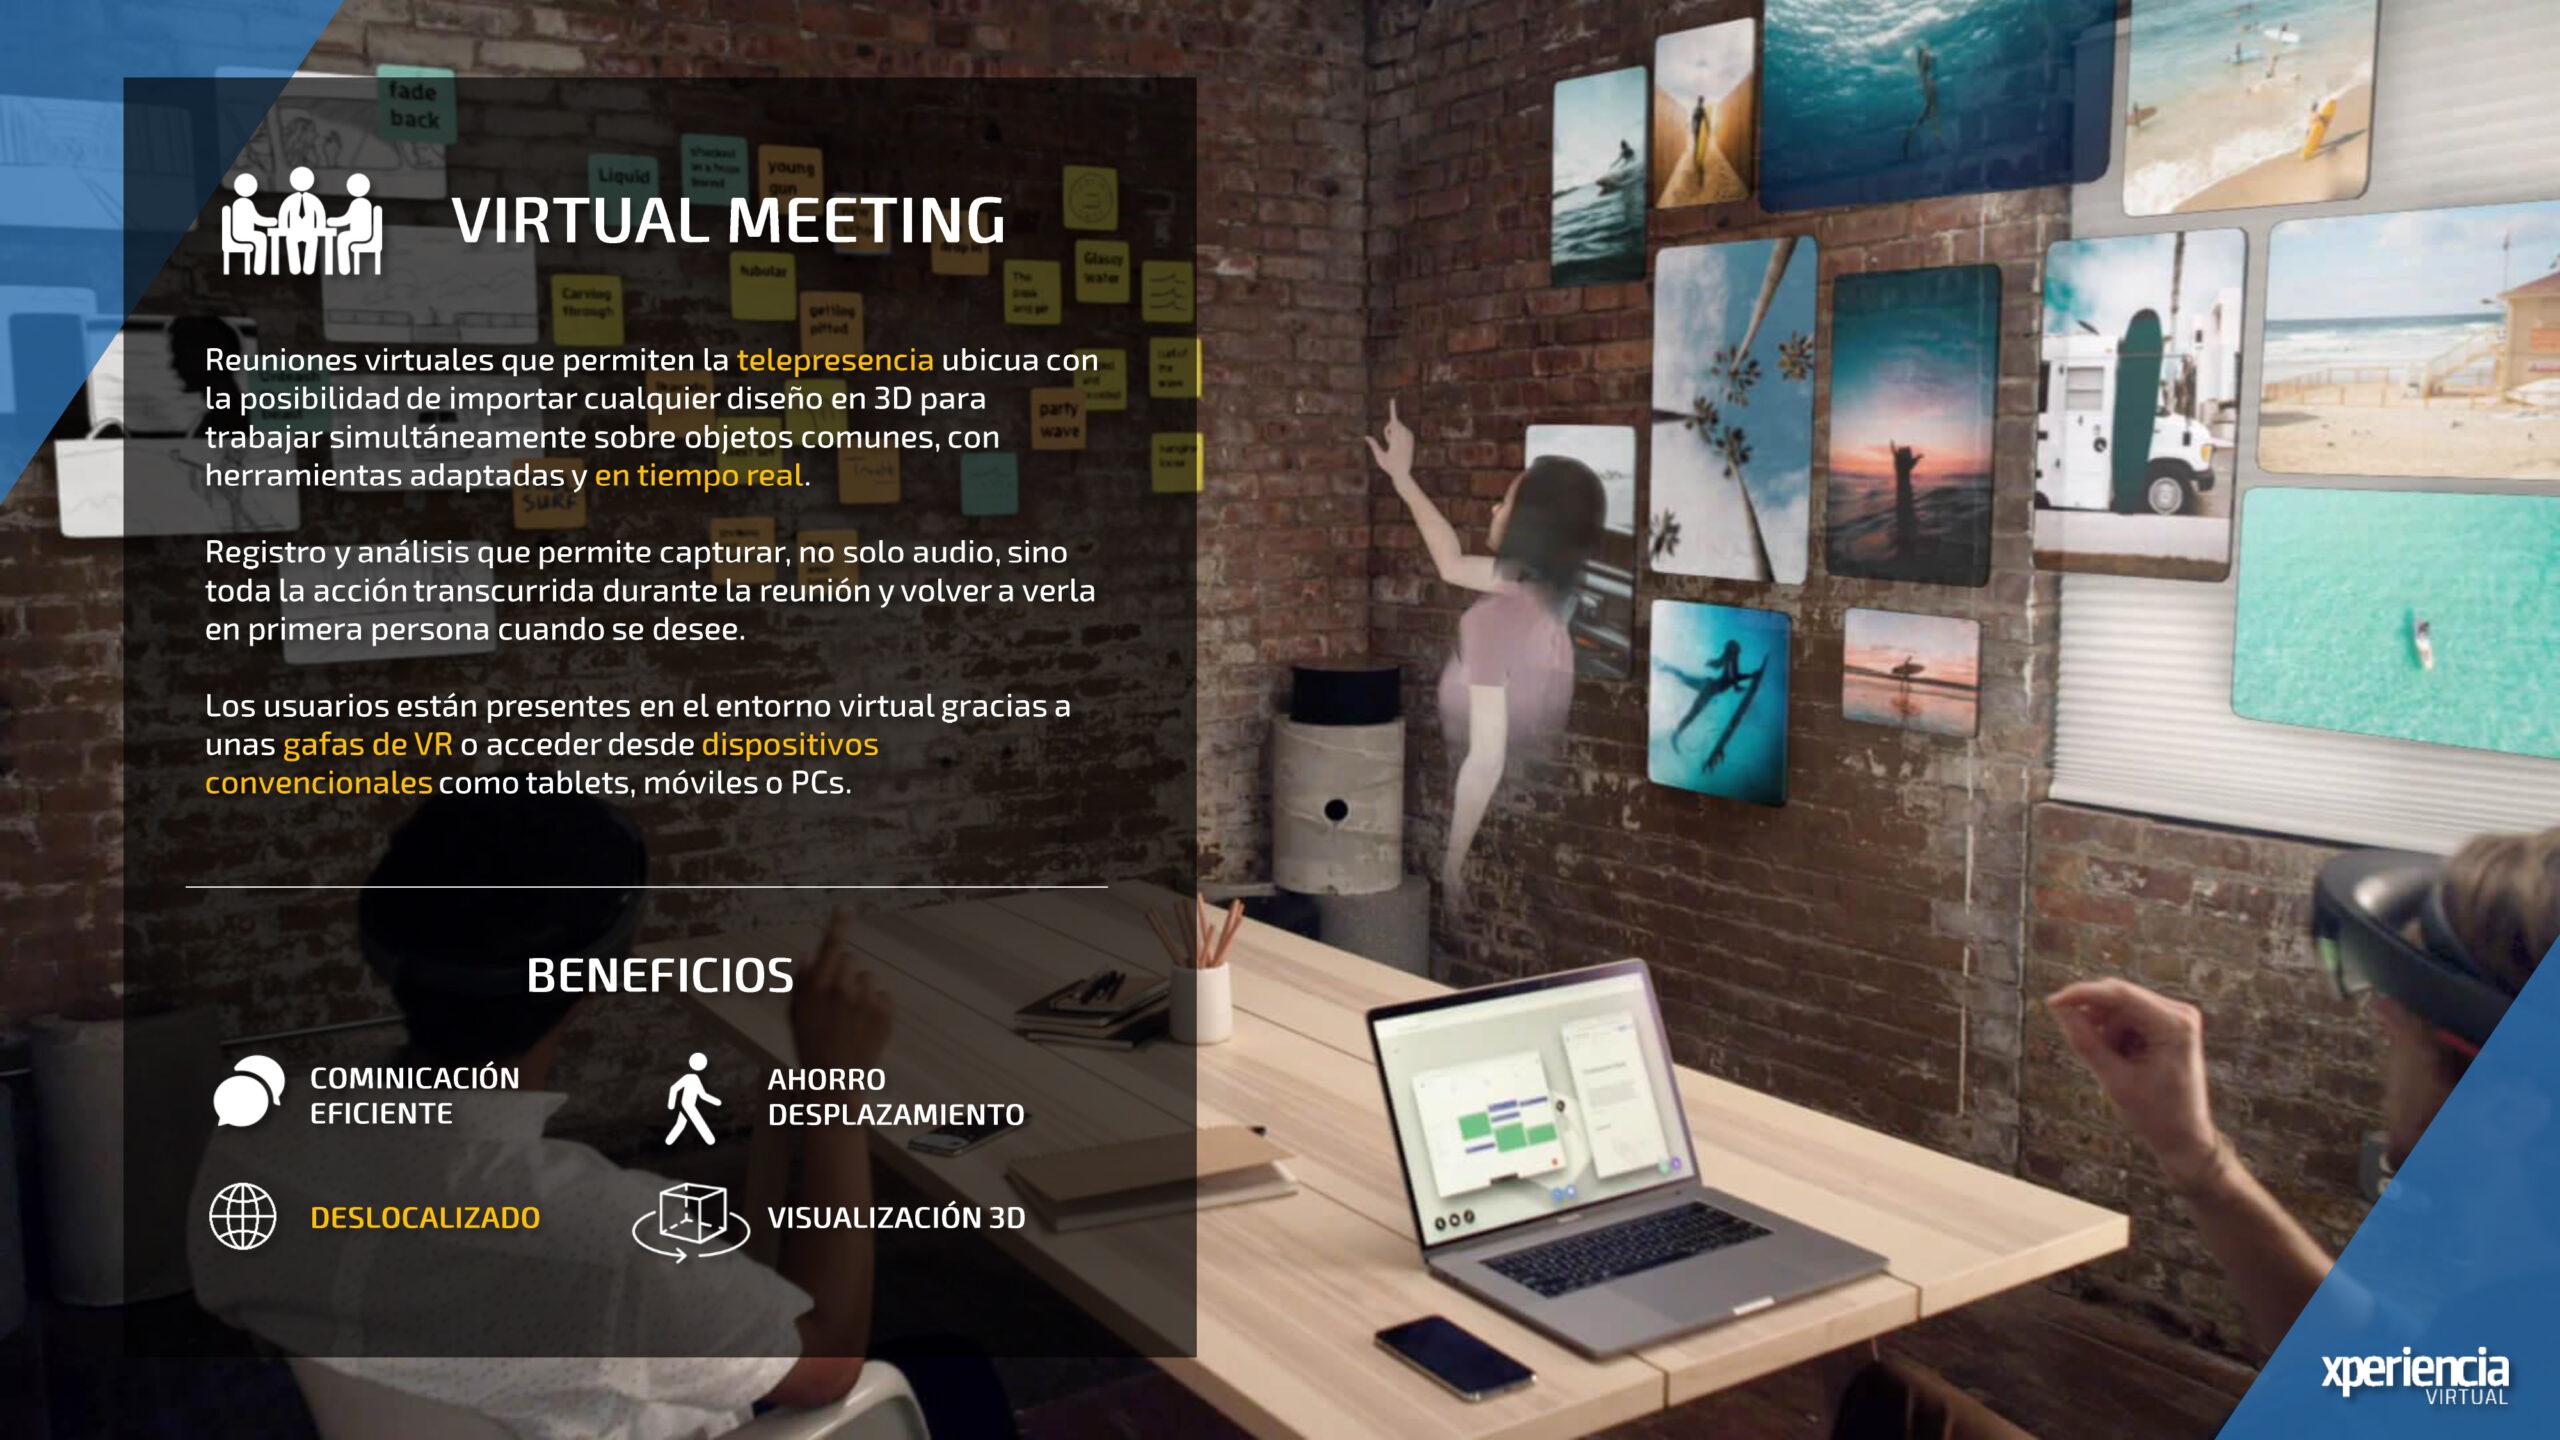 Virtual Meeting Realidad Virtual Realidad Aumentada Industria 4.0